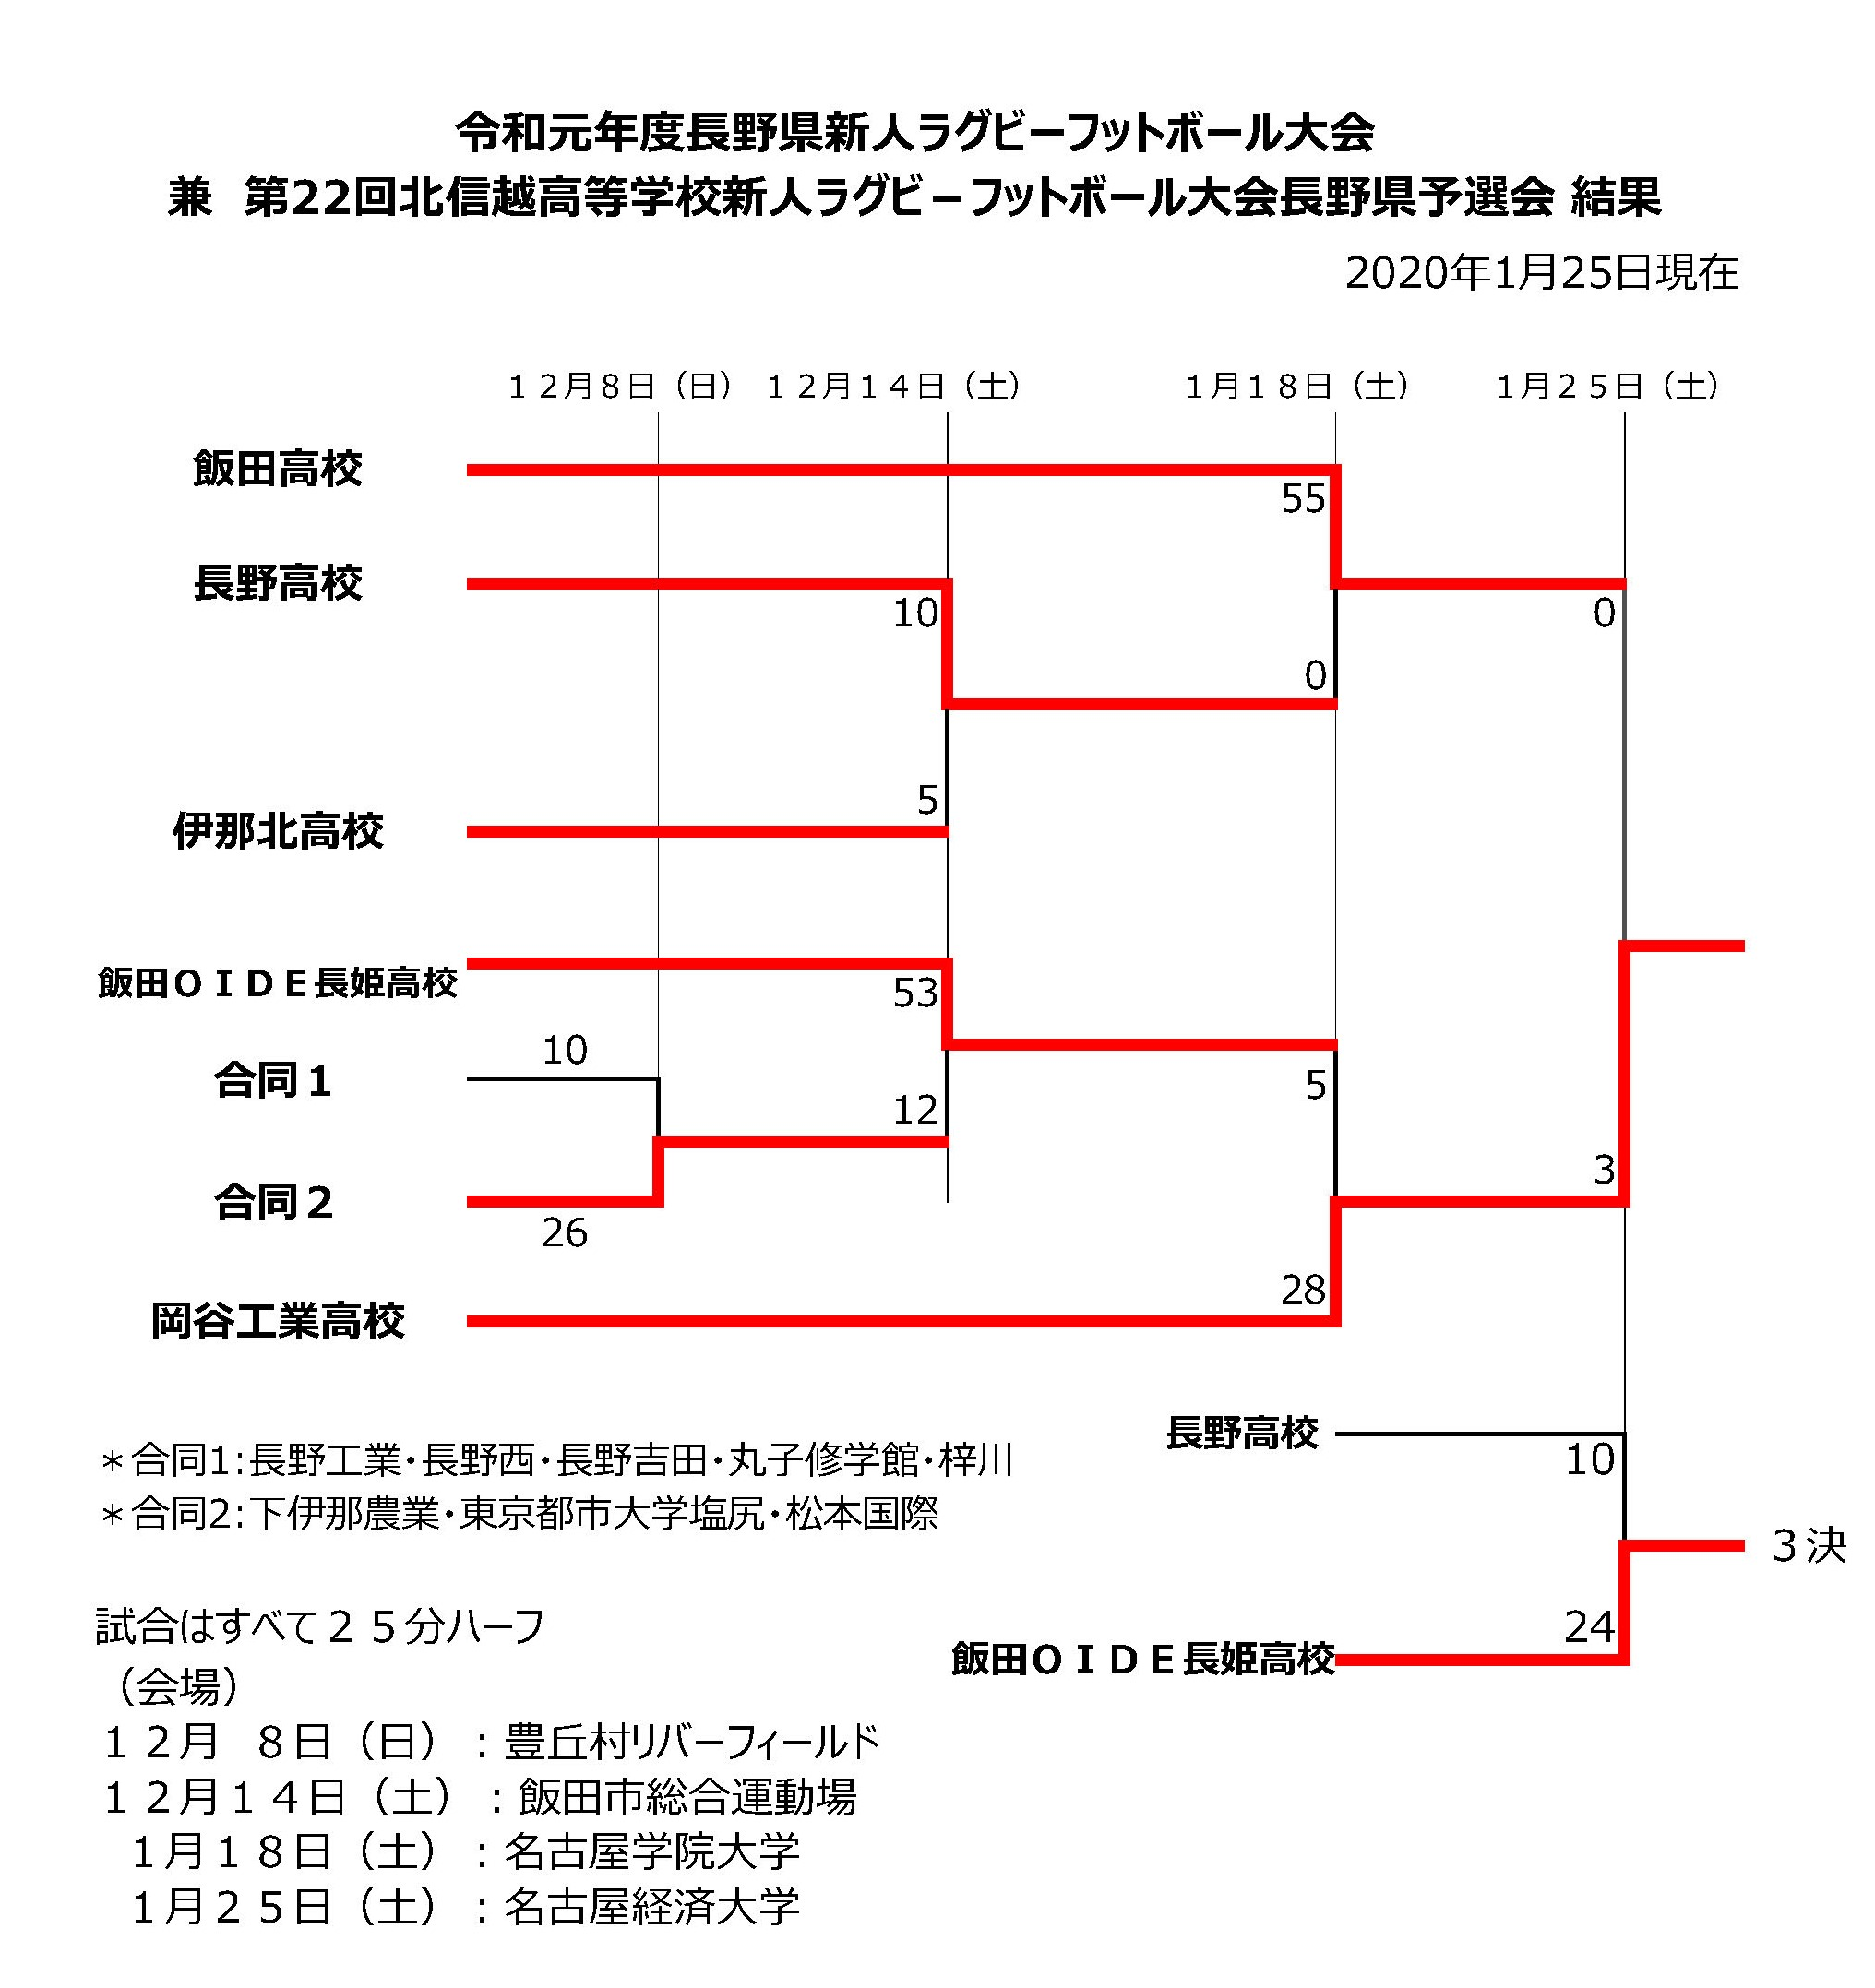 2019-shinjin20200125.jpg